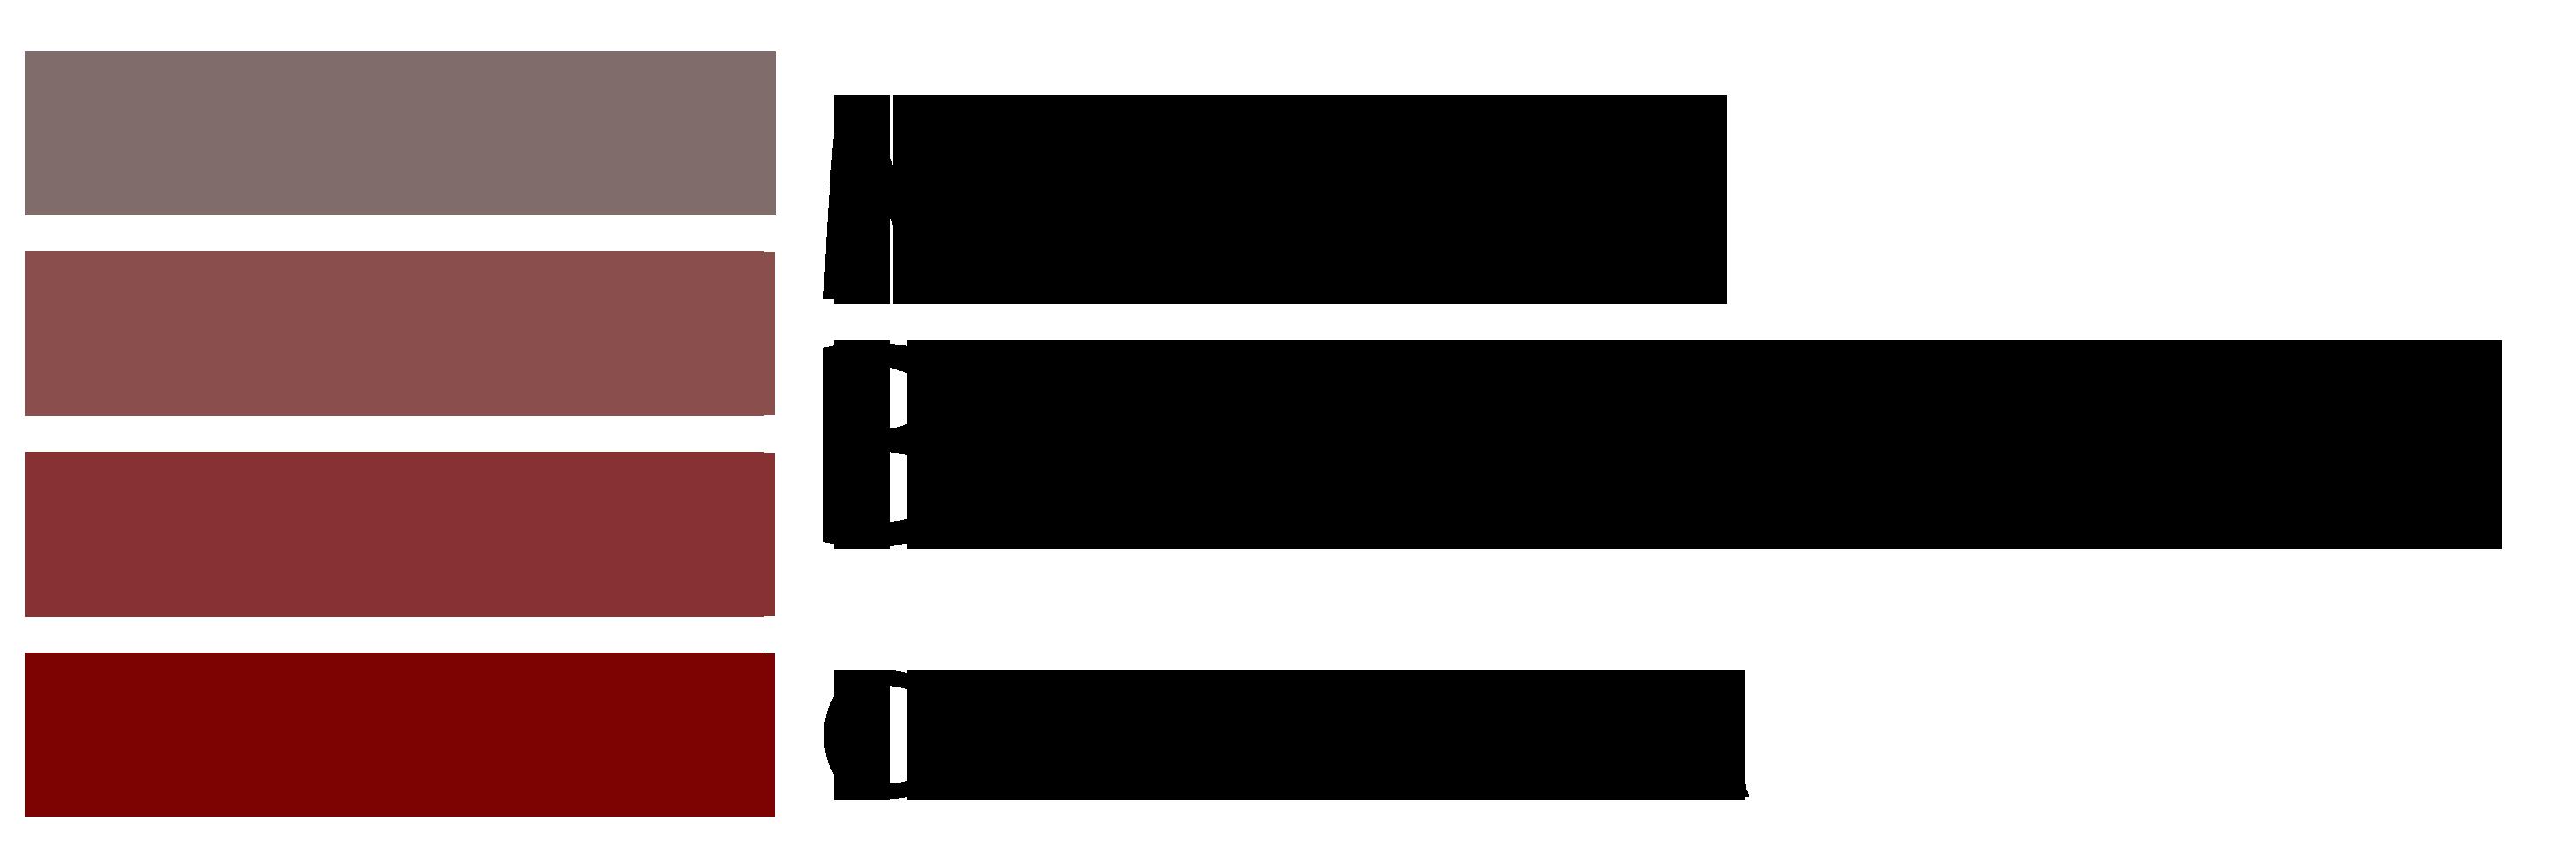 marco_logo (2)